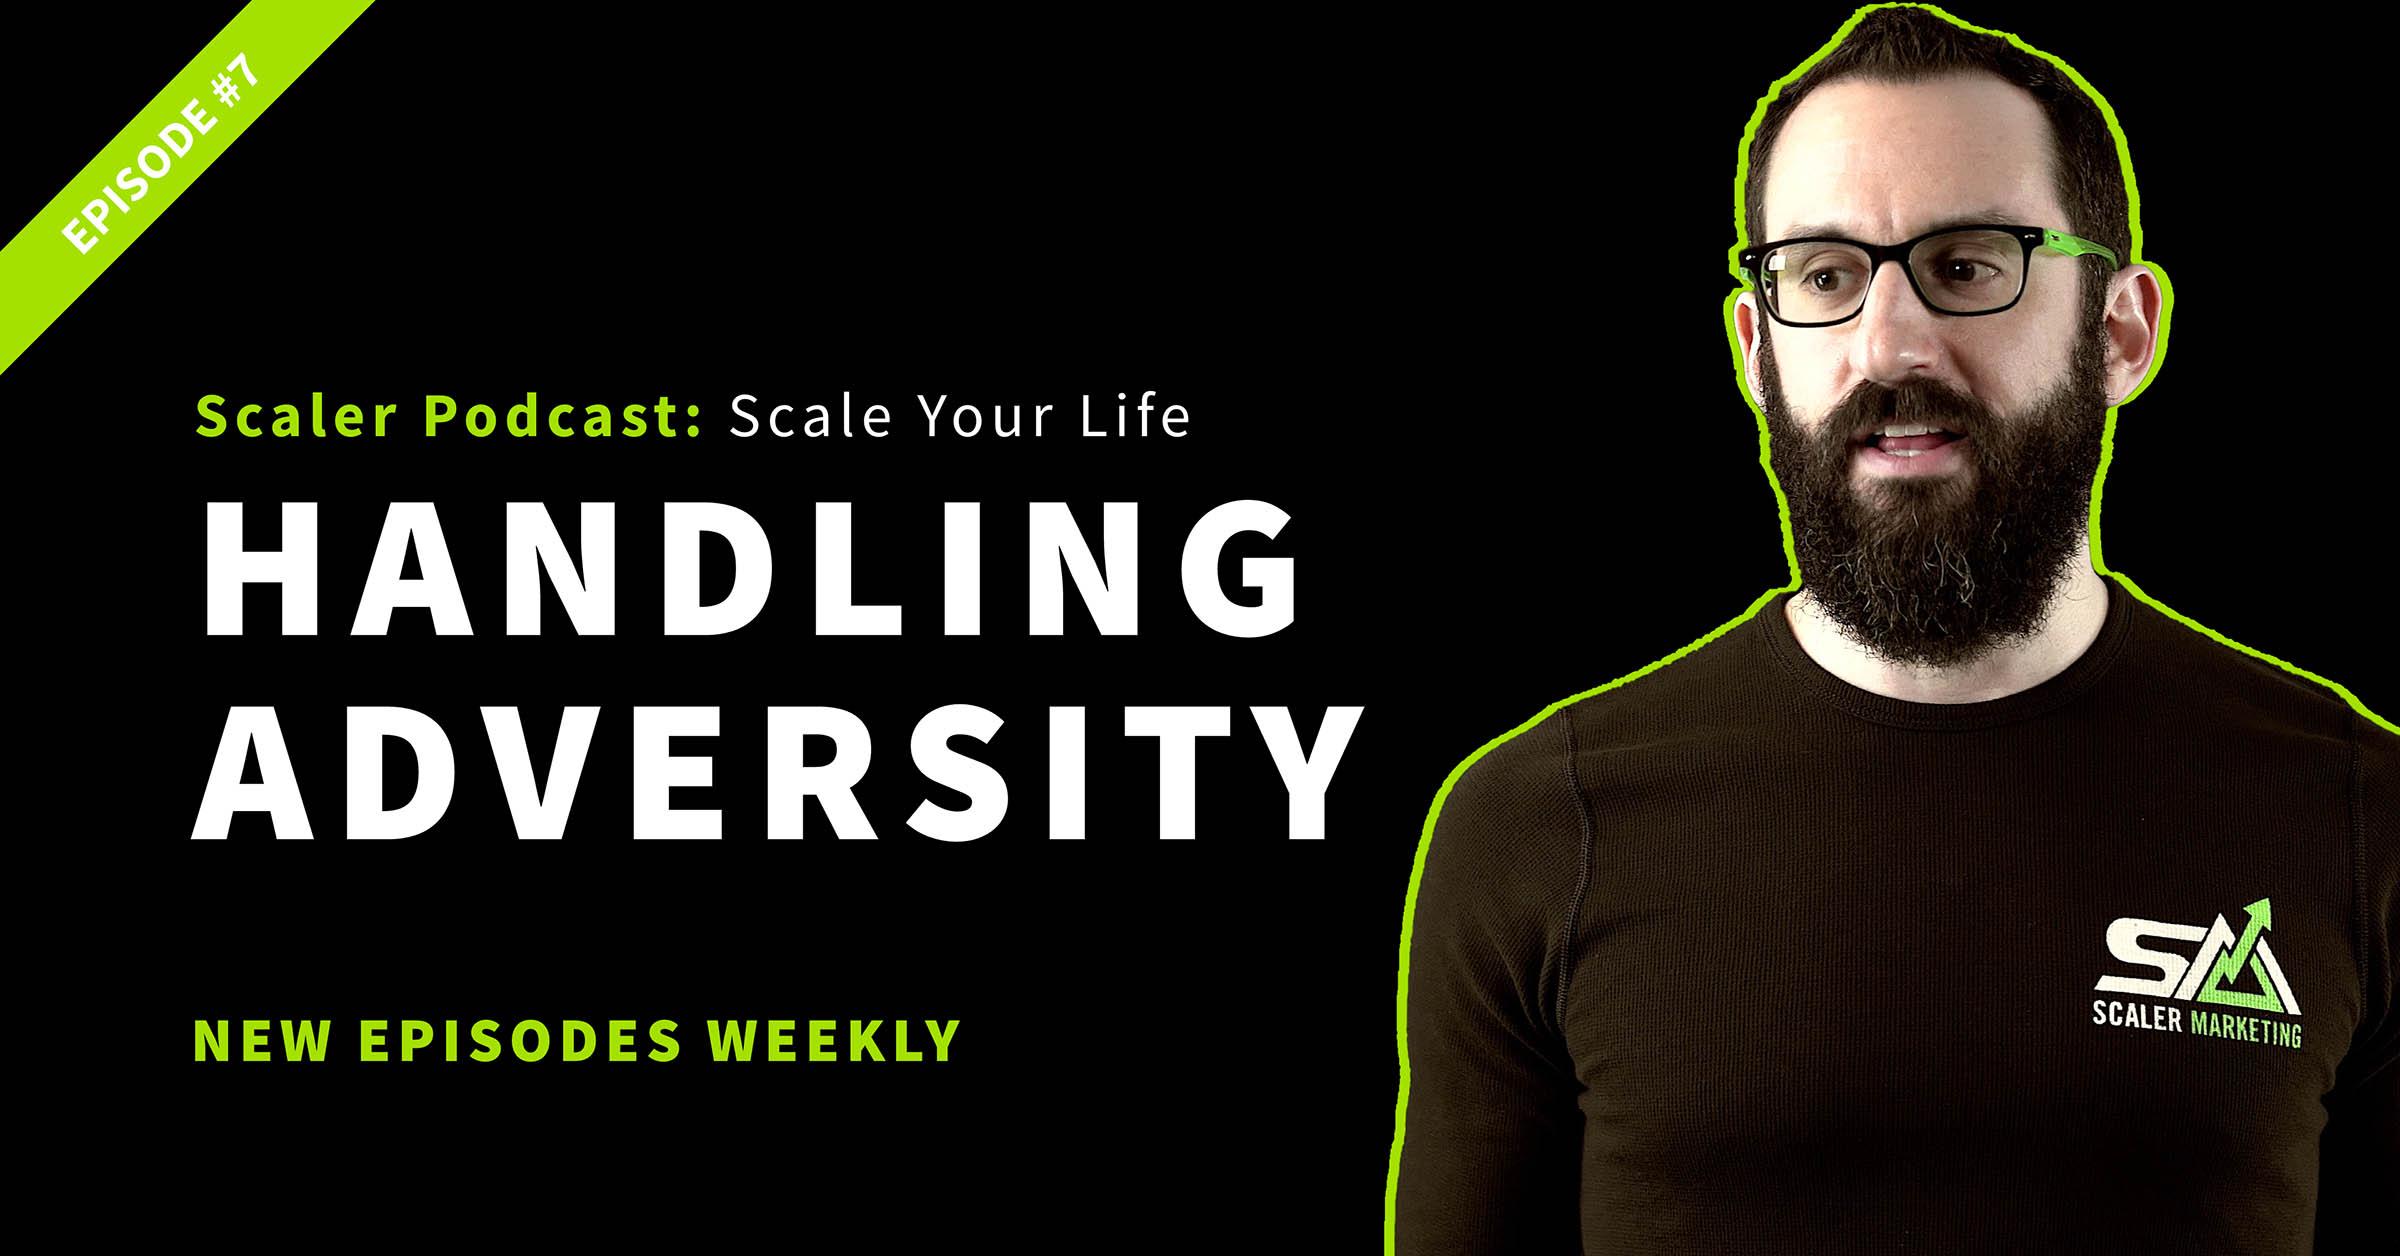 Episode 7 - Handling Adversity